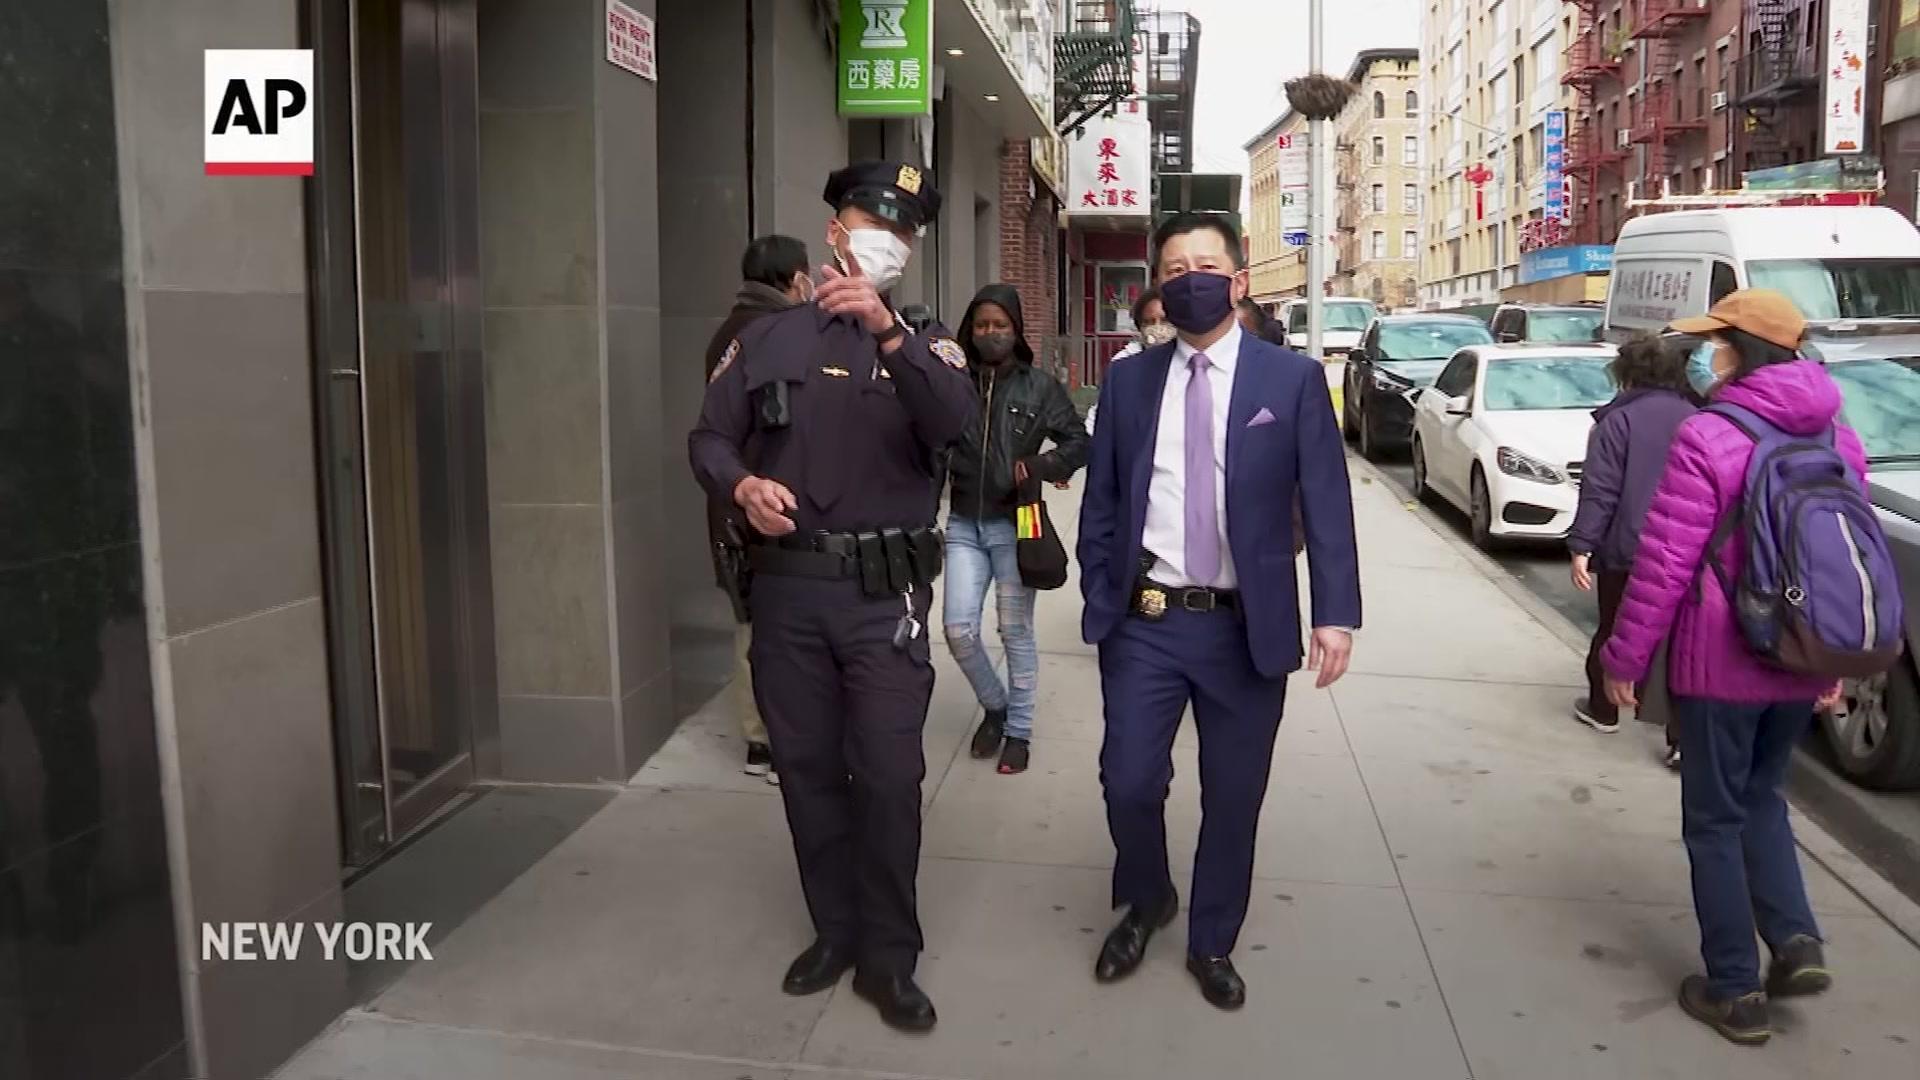 news.yahoo.com: Police: Mental illness behind NYC Asian attacks